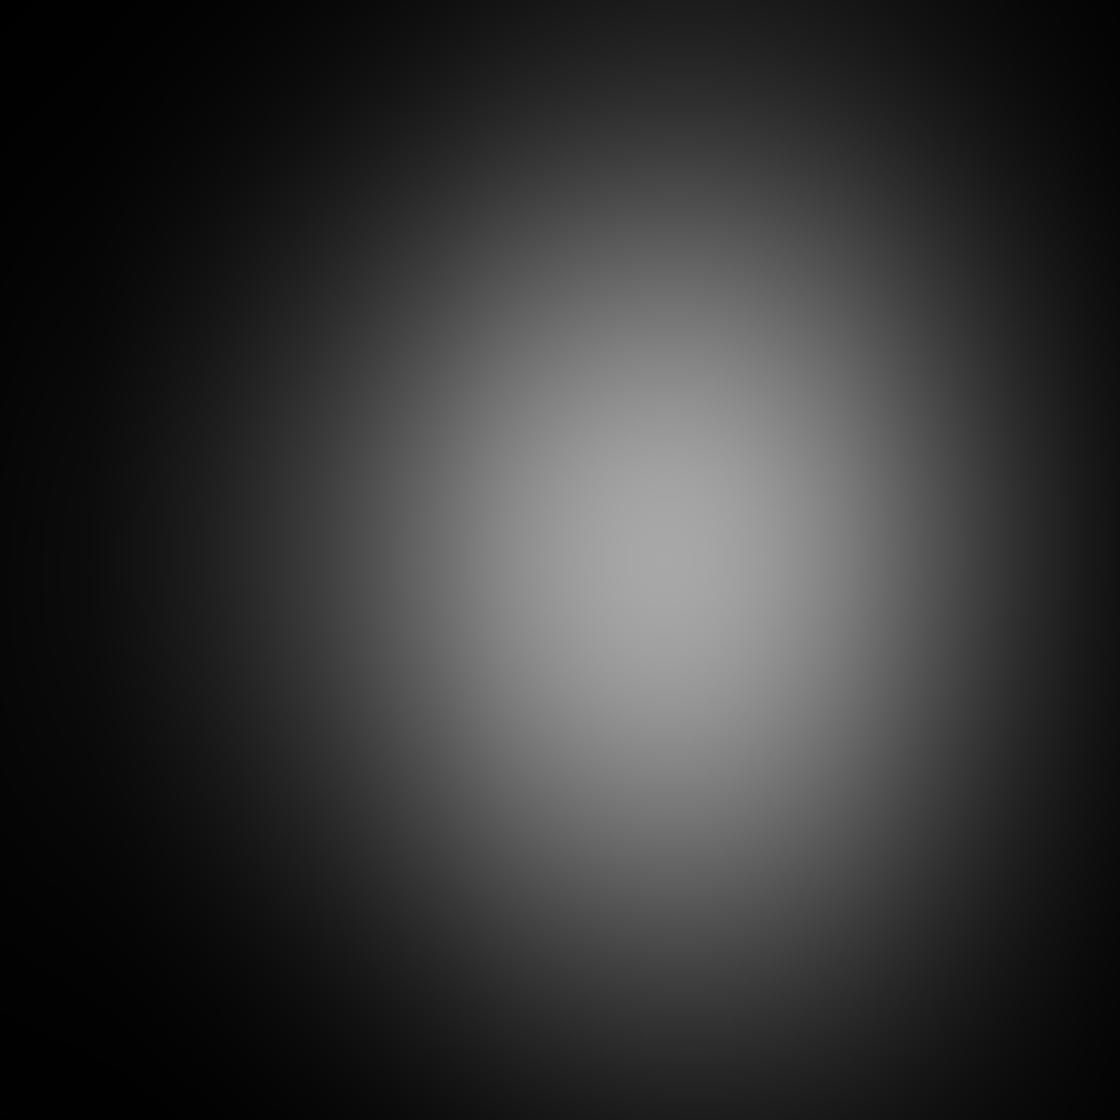 iPhone Photo Exposure 10